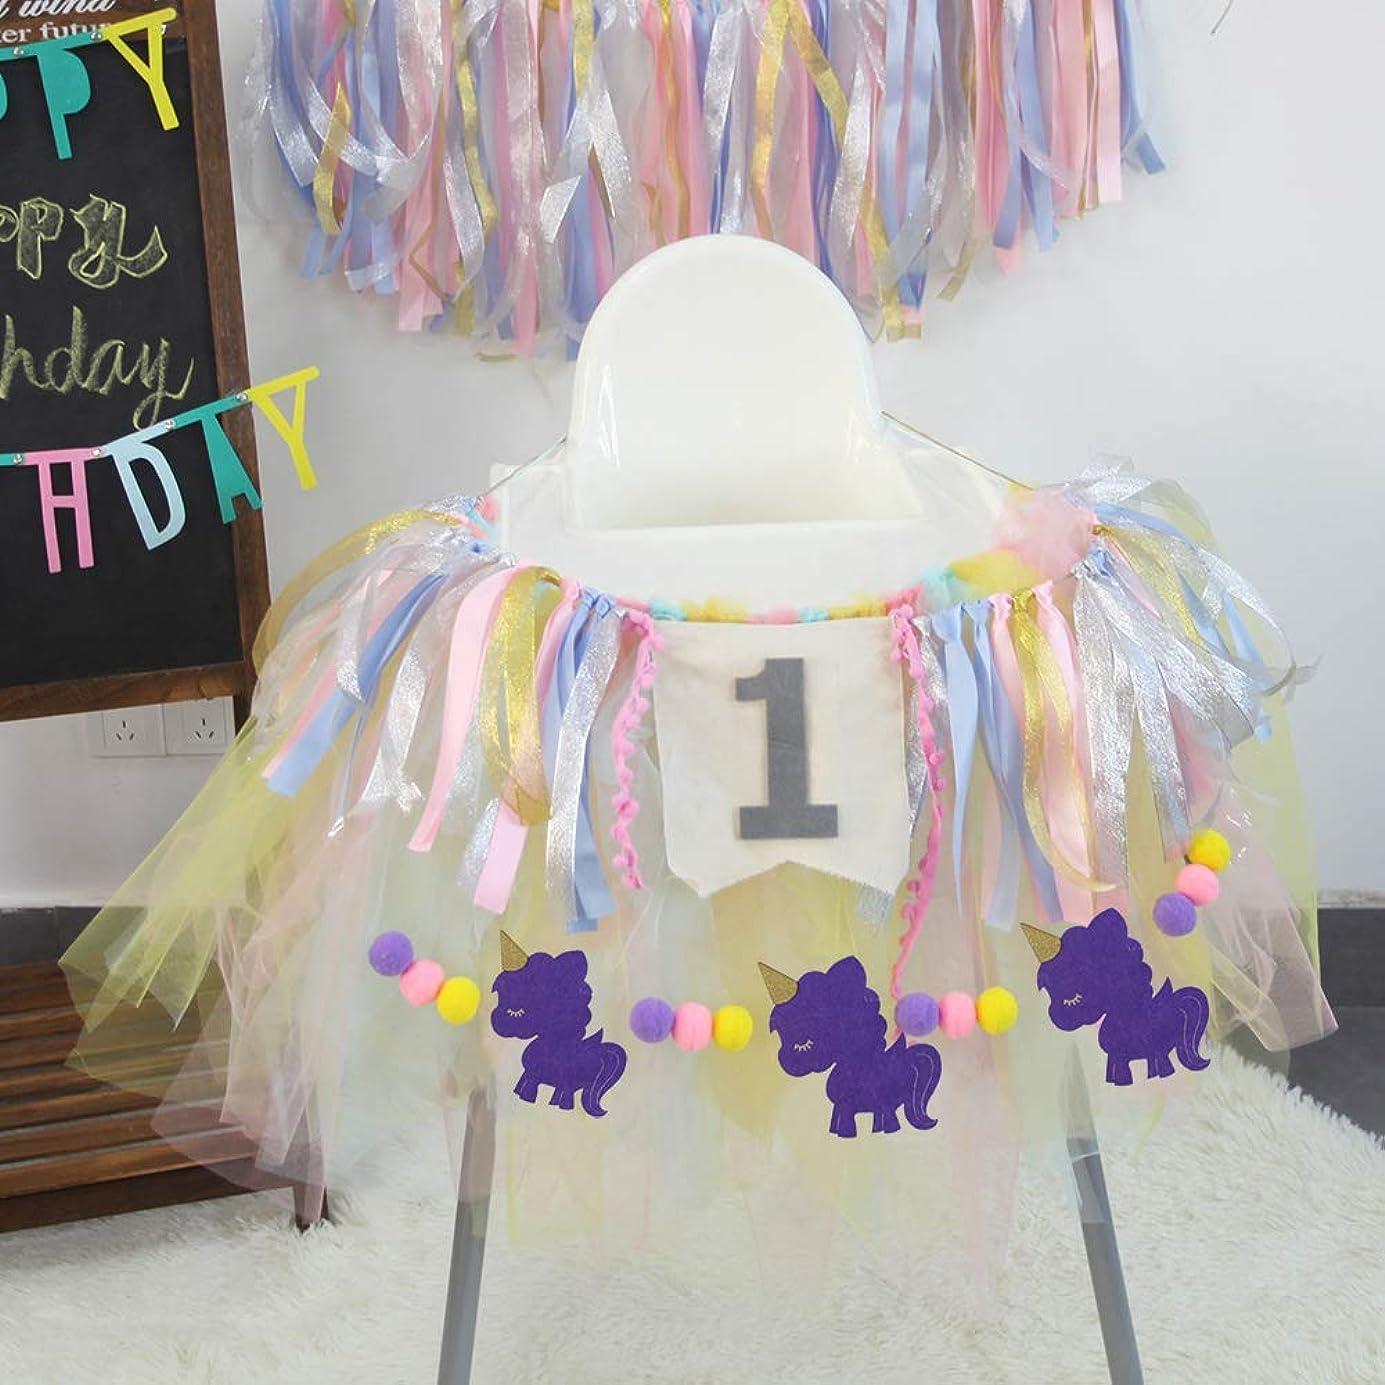 High Chair Skirt - 1st Birthday Baby Tutu High Chair Decoration for Birthday Party Supplies, Icluding Tutu Skirt+Unicorn Banner+1st Ribbon Banner (Purple) vuqcpd6755